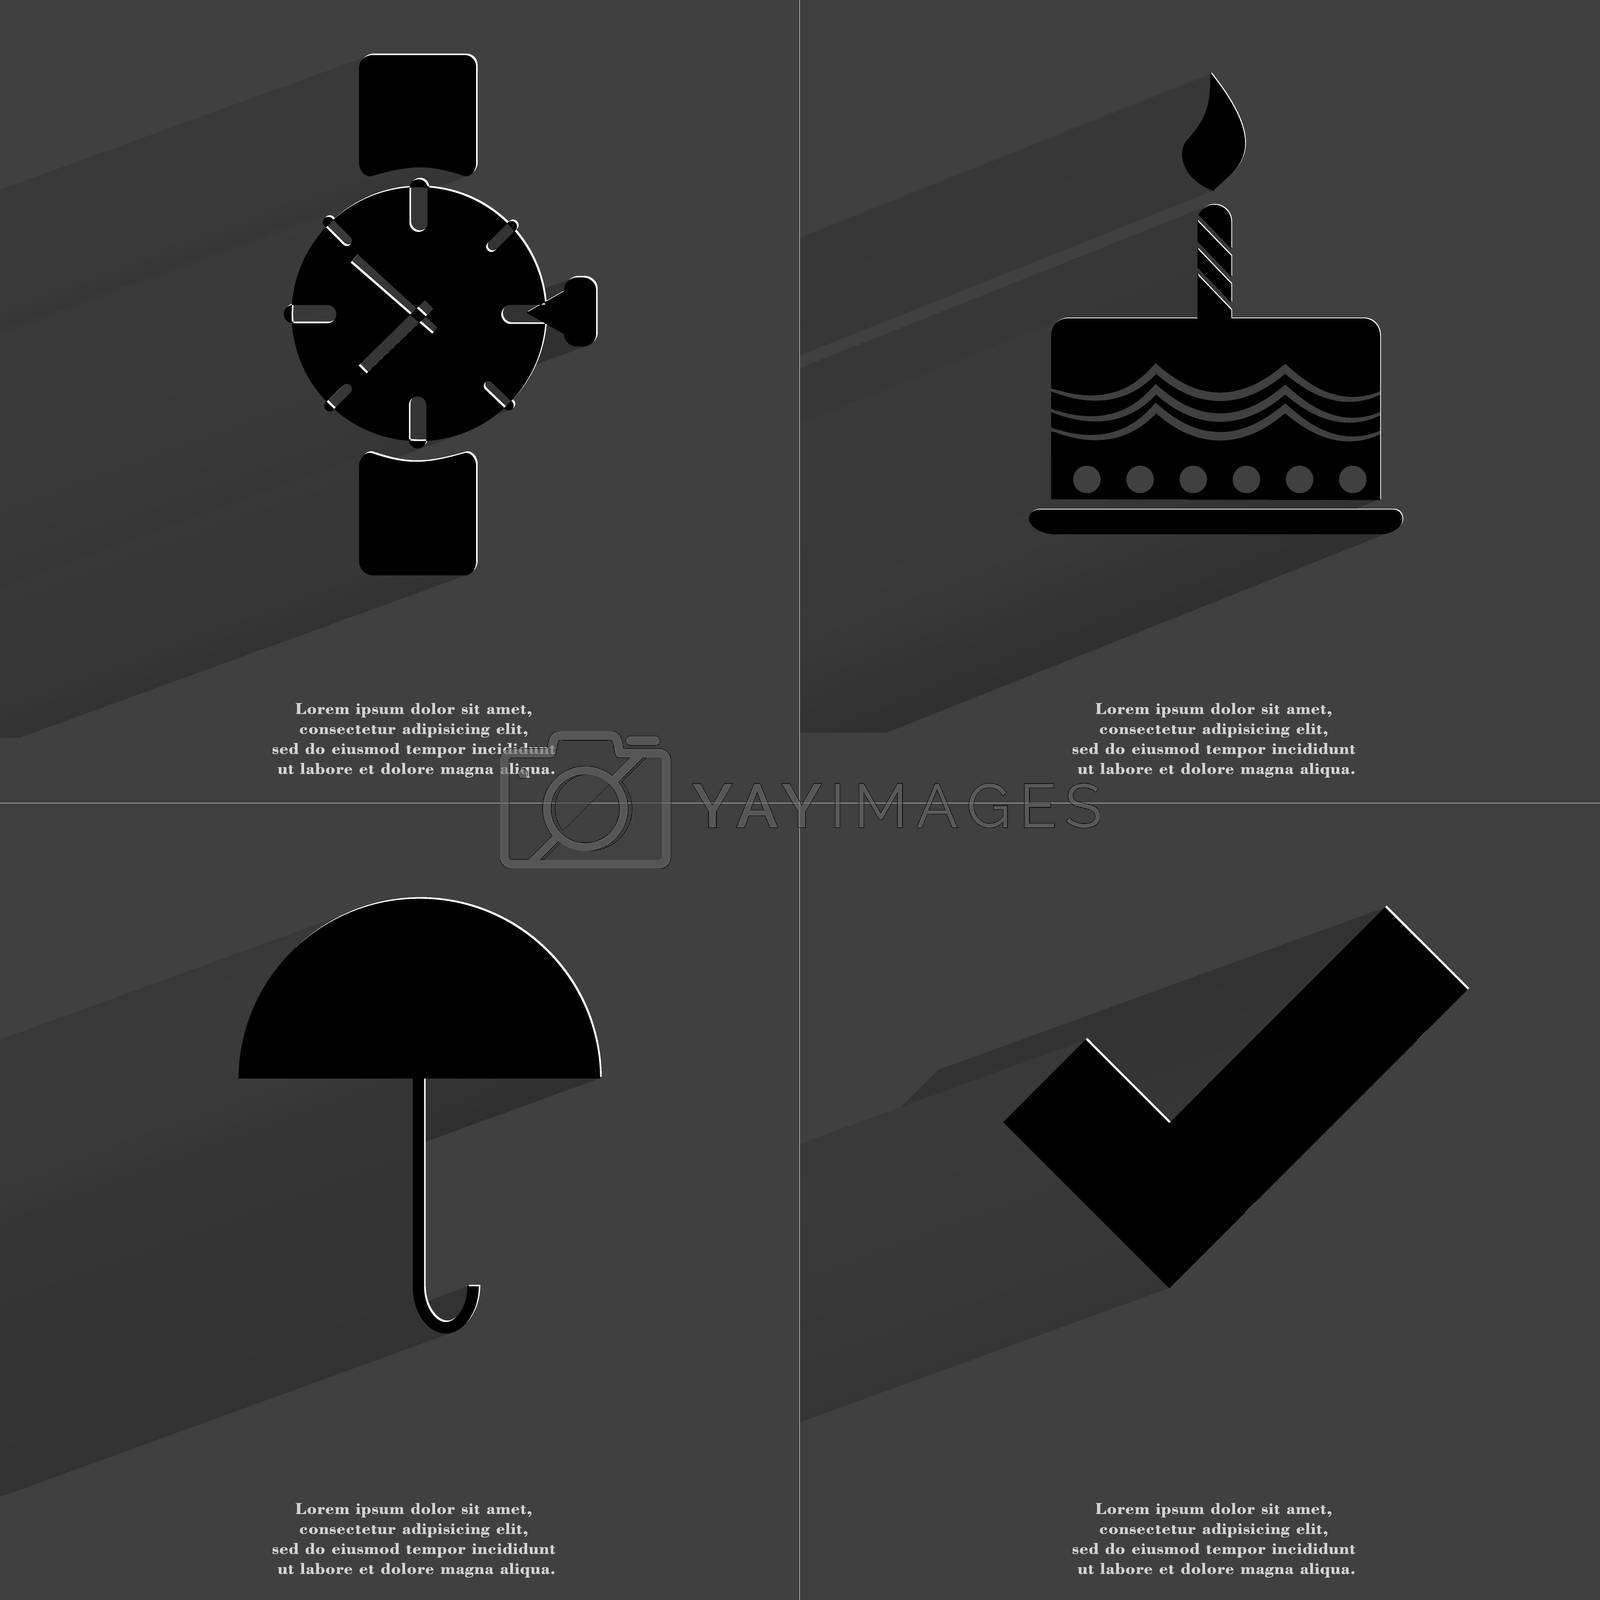 Wrist watch,  Cake, Umbrella, Tick sign. Symbols with long shadow. Flat design by serhii_lohvyniuk